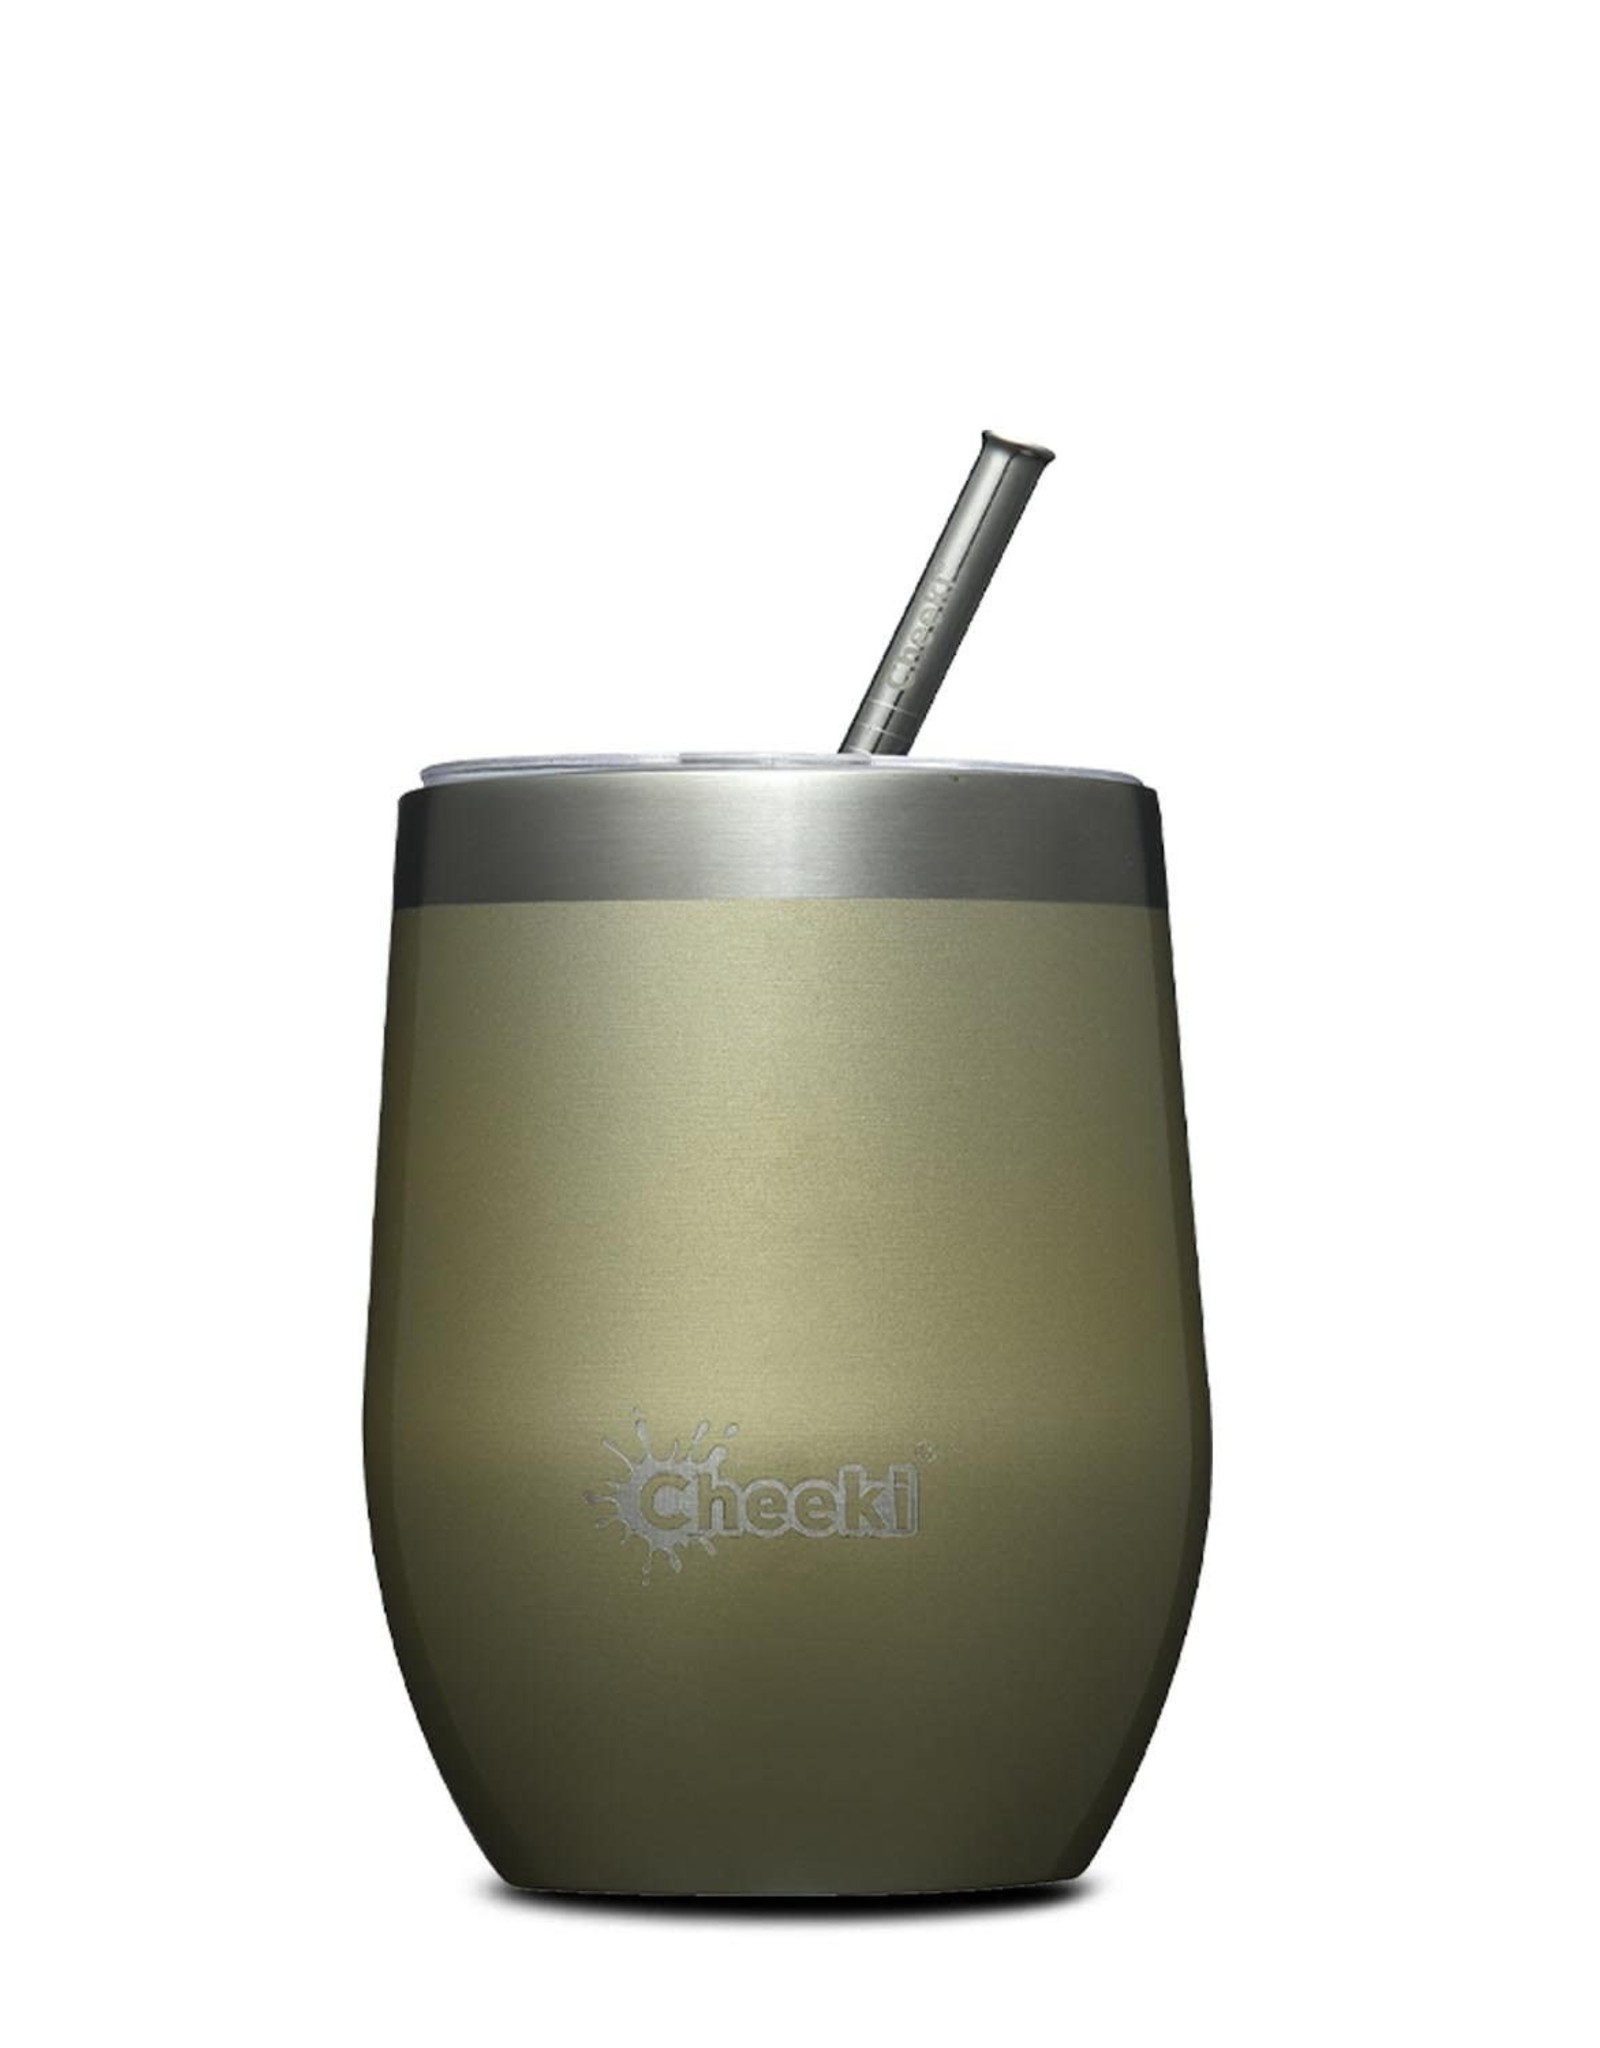 Cheeki Insulated Wine Tumbler with Stainless Steel Straw